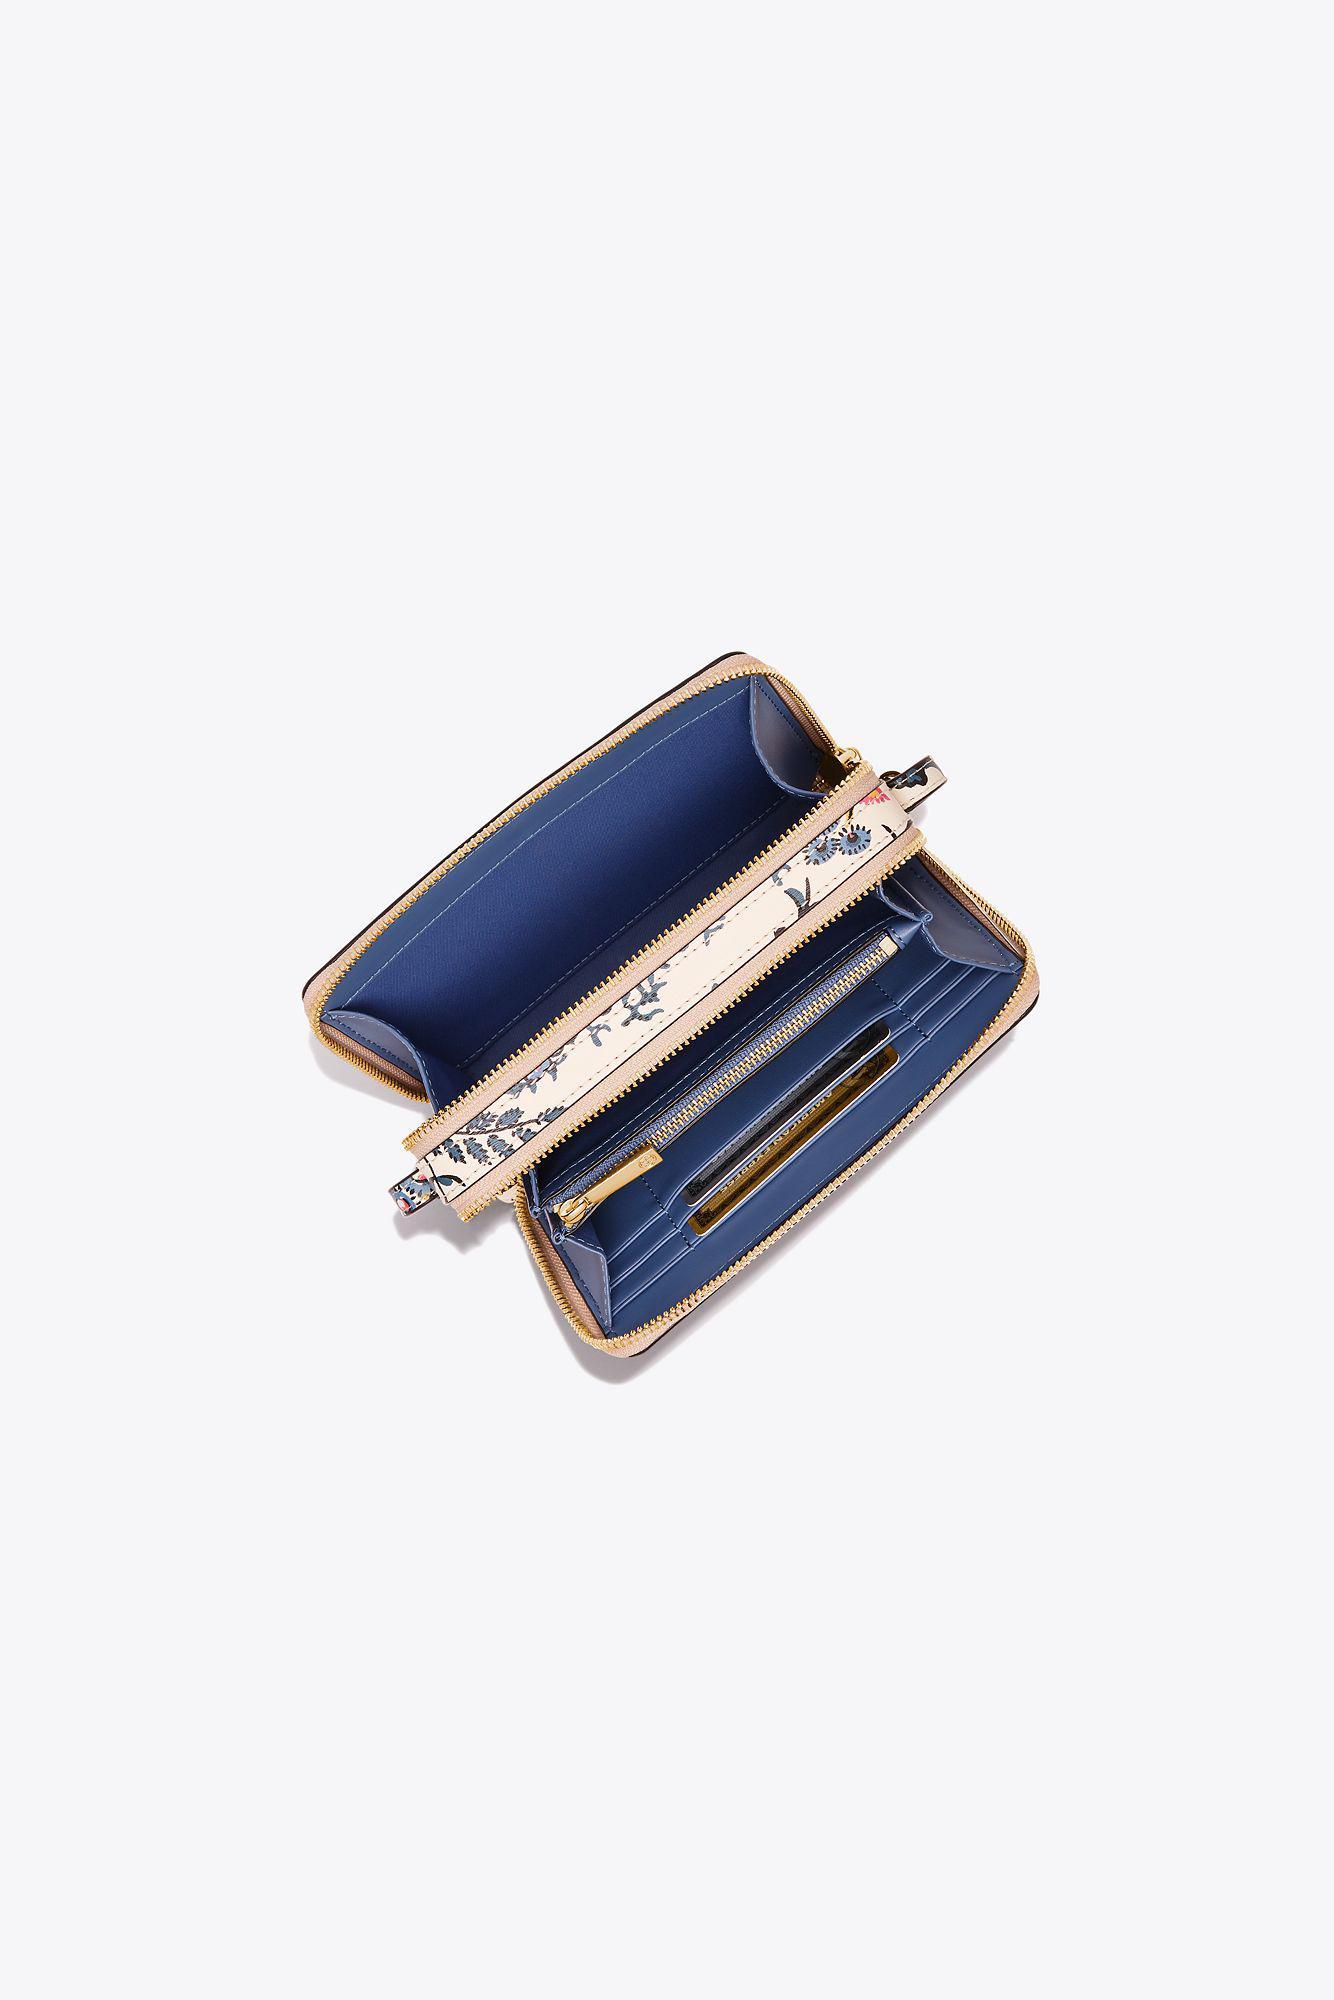 796ae1ac671 Lyst - Tory Burch Parker Floral Double-zip Mini Bag